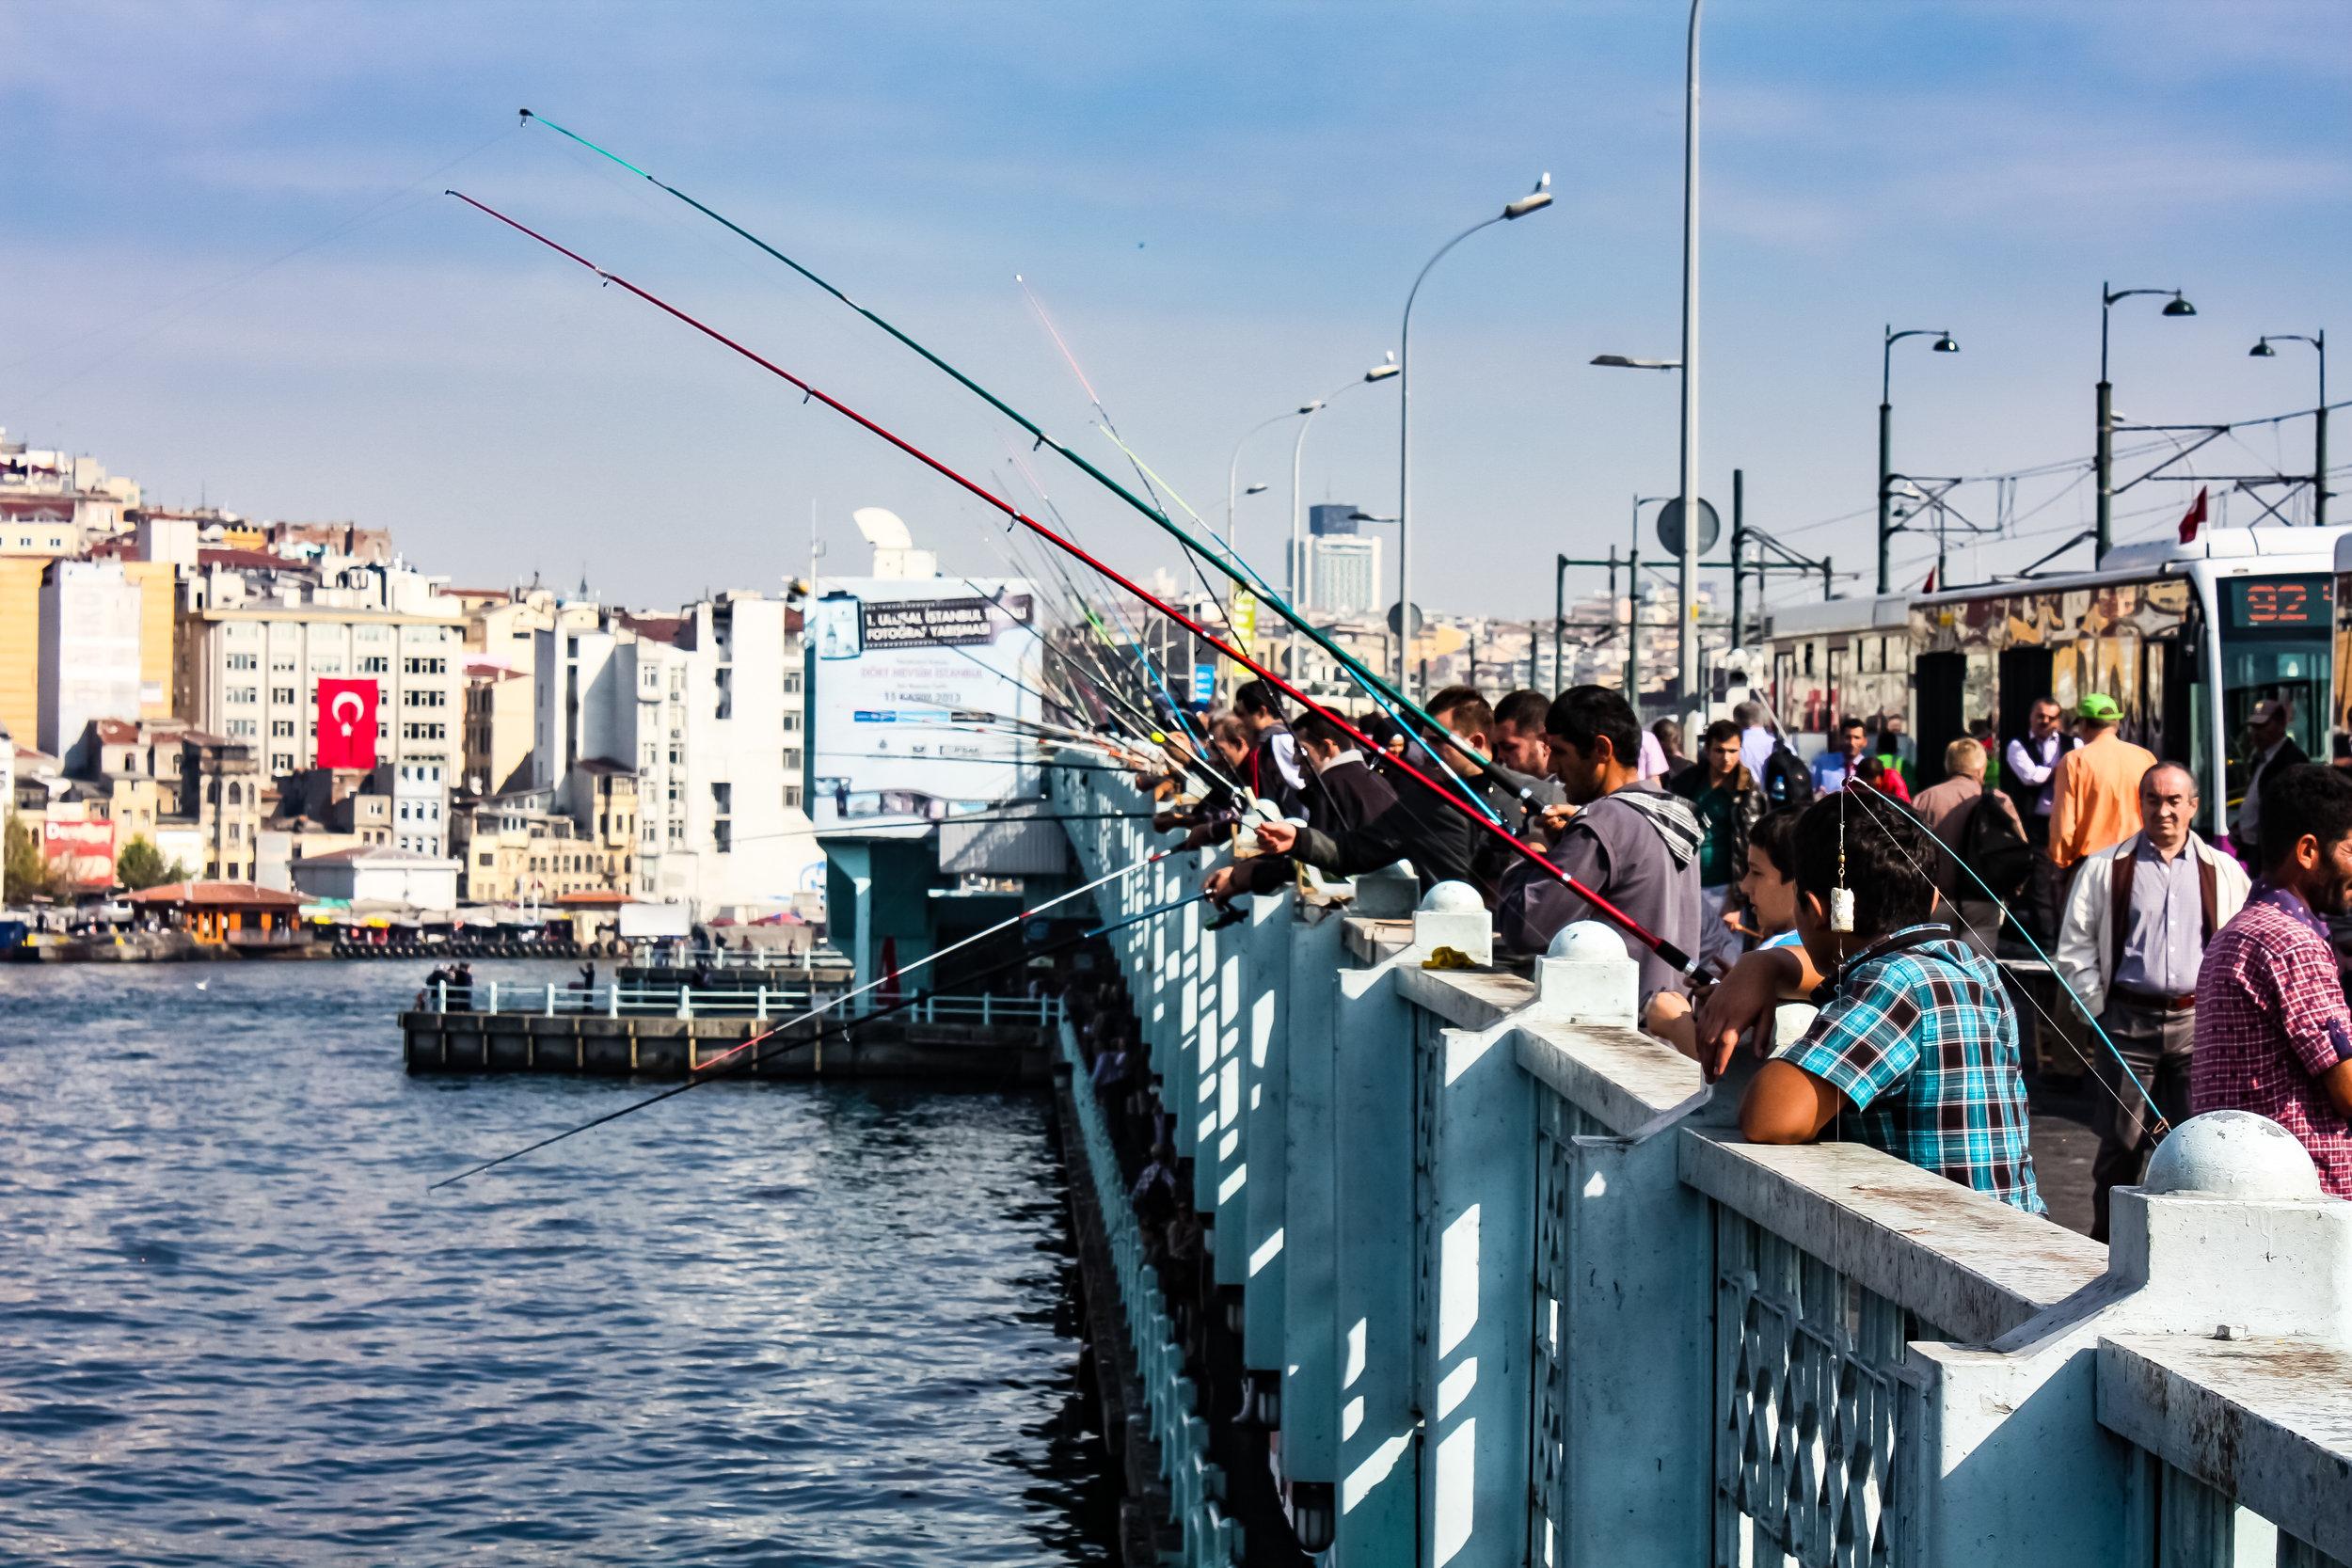 thetravelhub_istanbul_galata bridge-3811.jpg